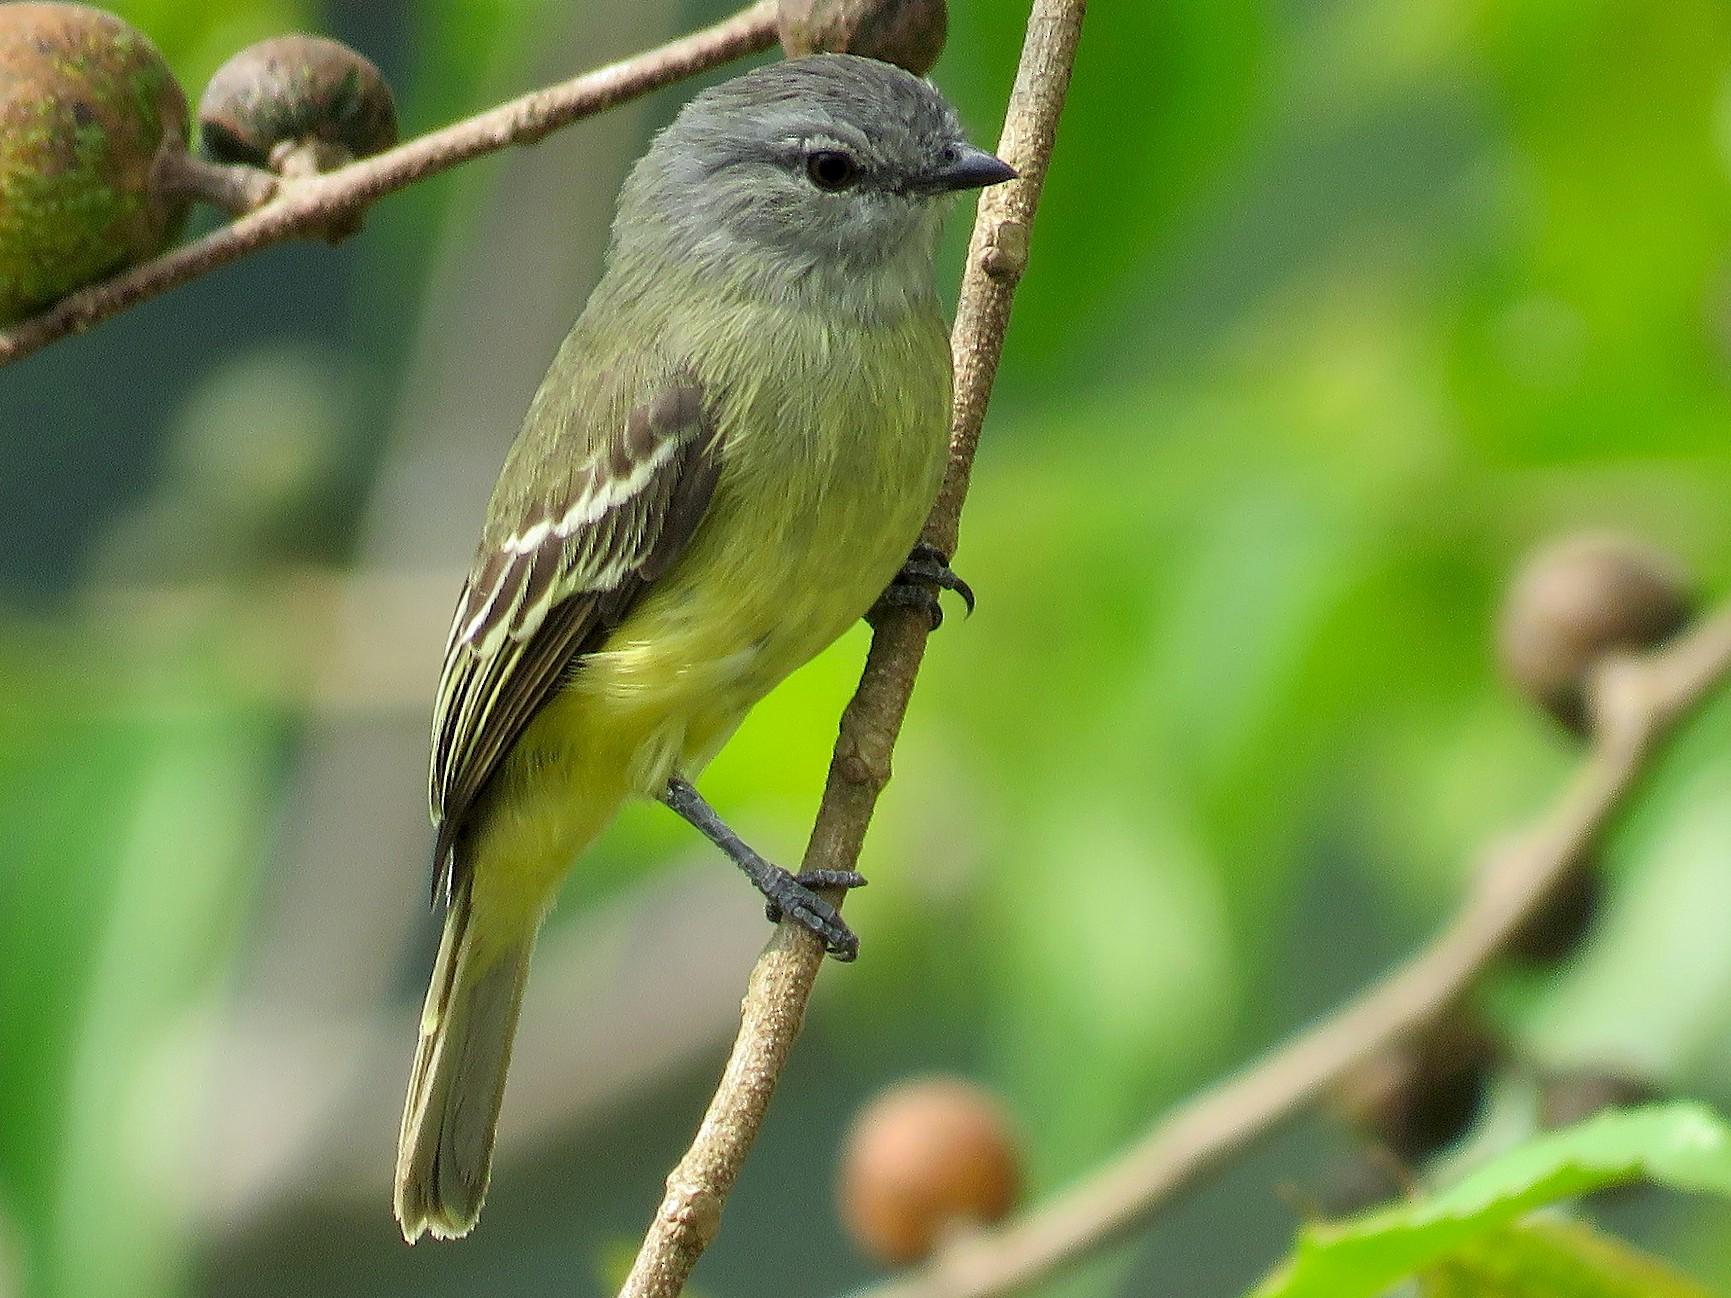 Yellow-crowned Tyrannulet - Rolando Jordan